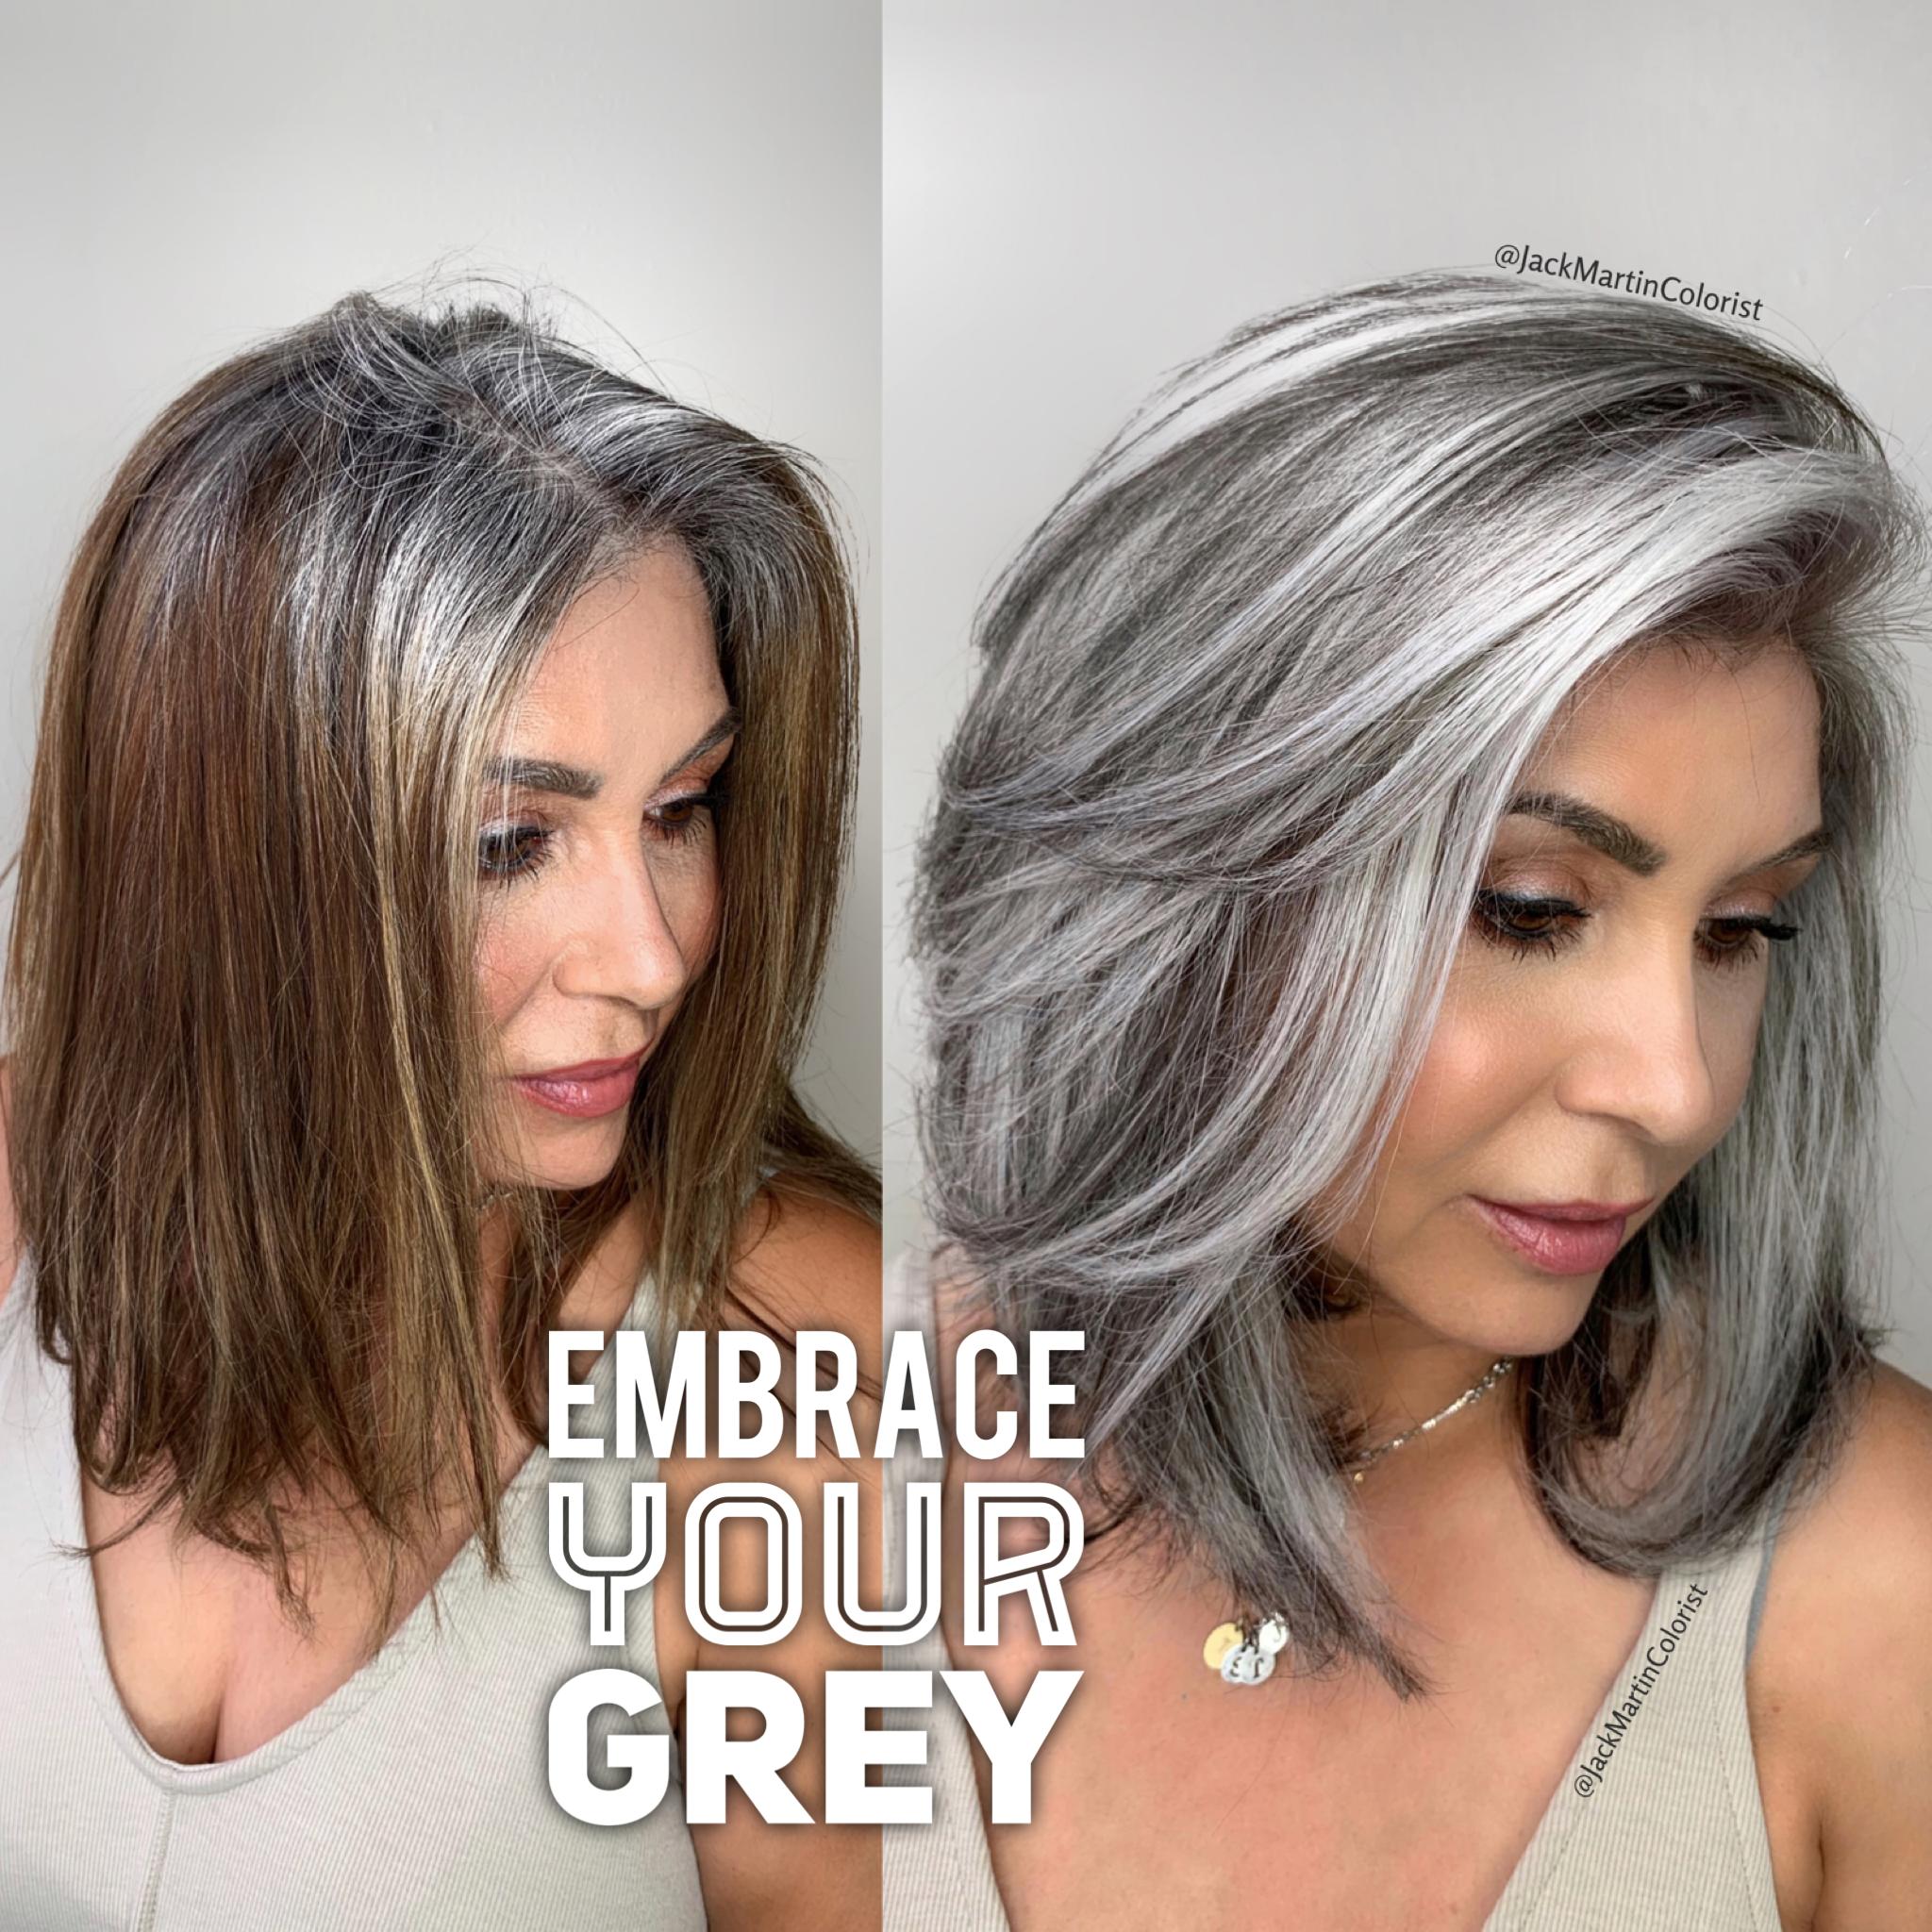 Silverhair Greyhair Grayhair Hair Haircut Haircolor Haircoloring Platinumhair Ditchthedye Gre Gray Hair Highlights Long Gray Hair Blending Gray Hair